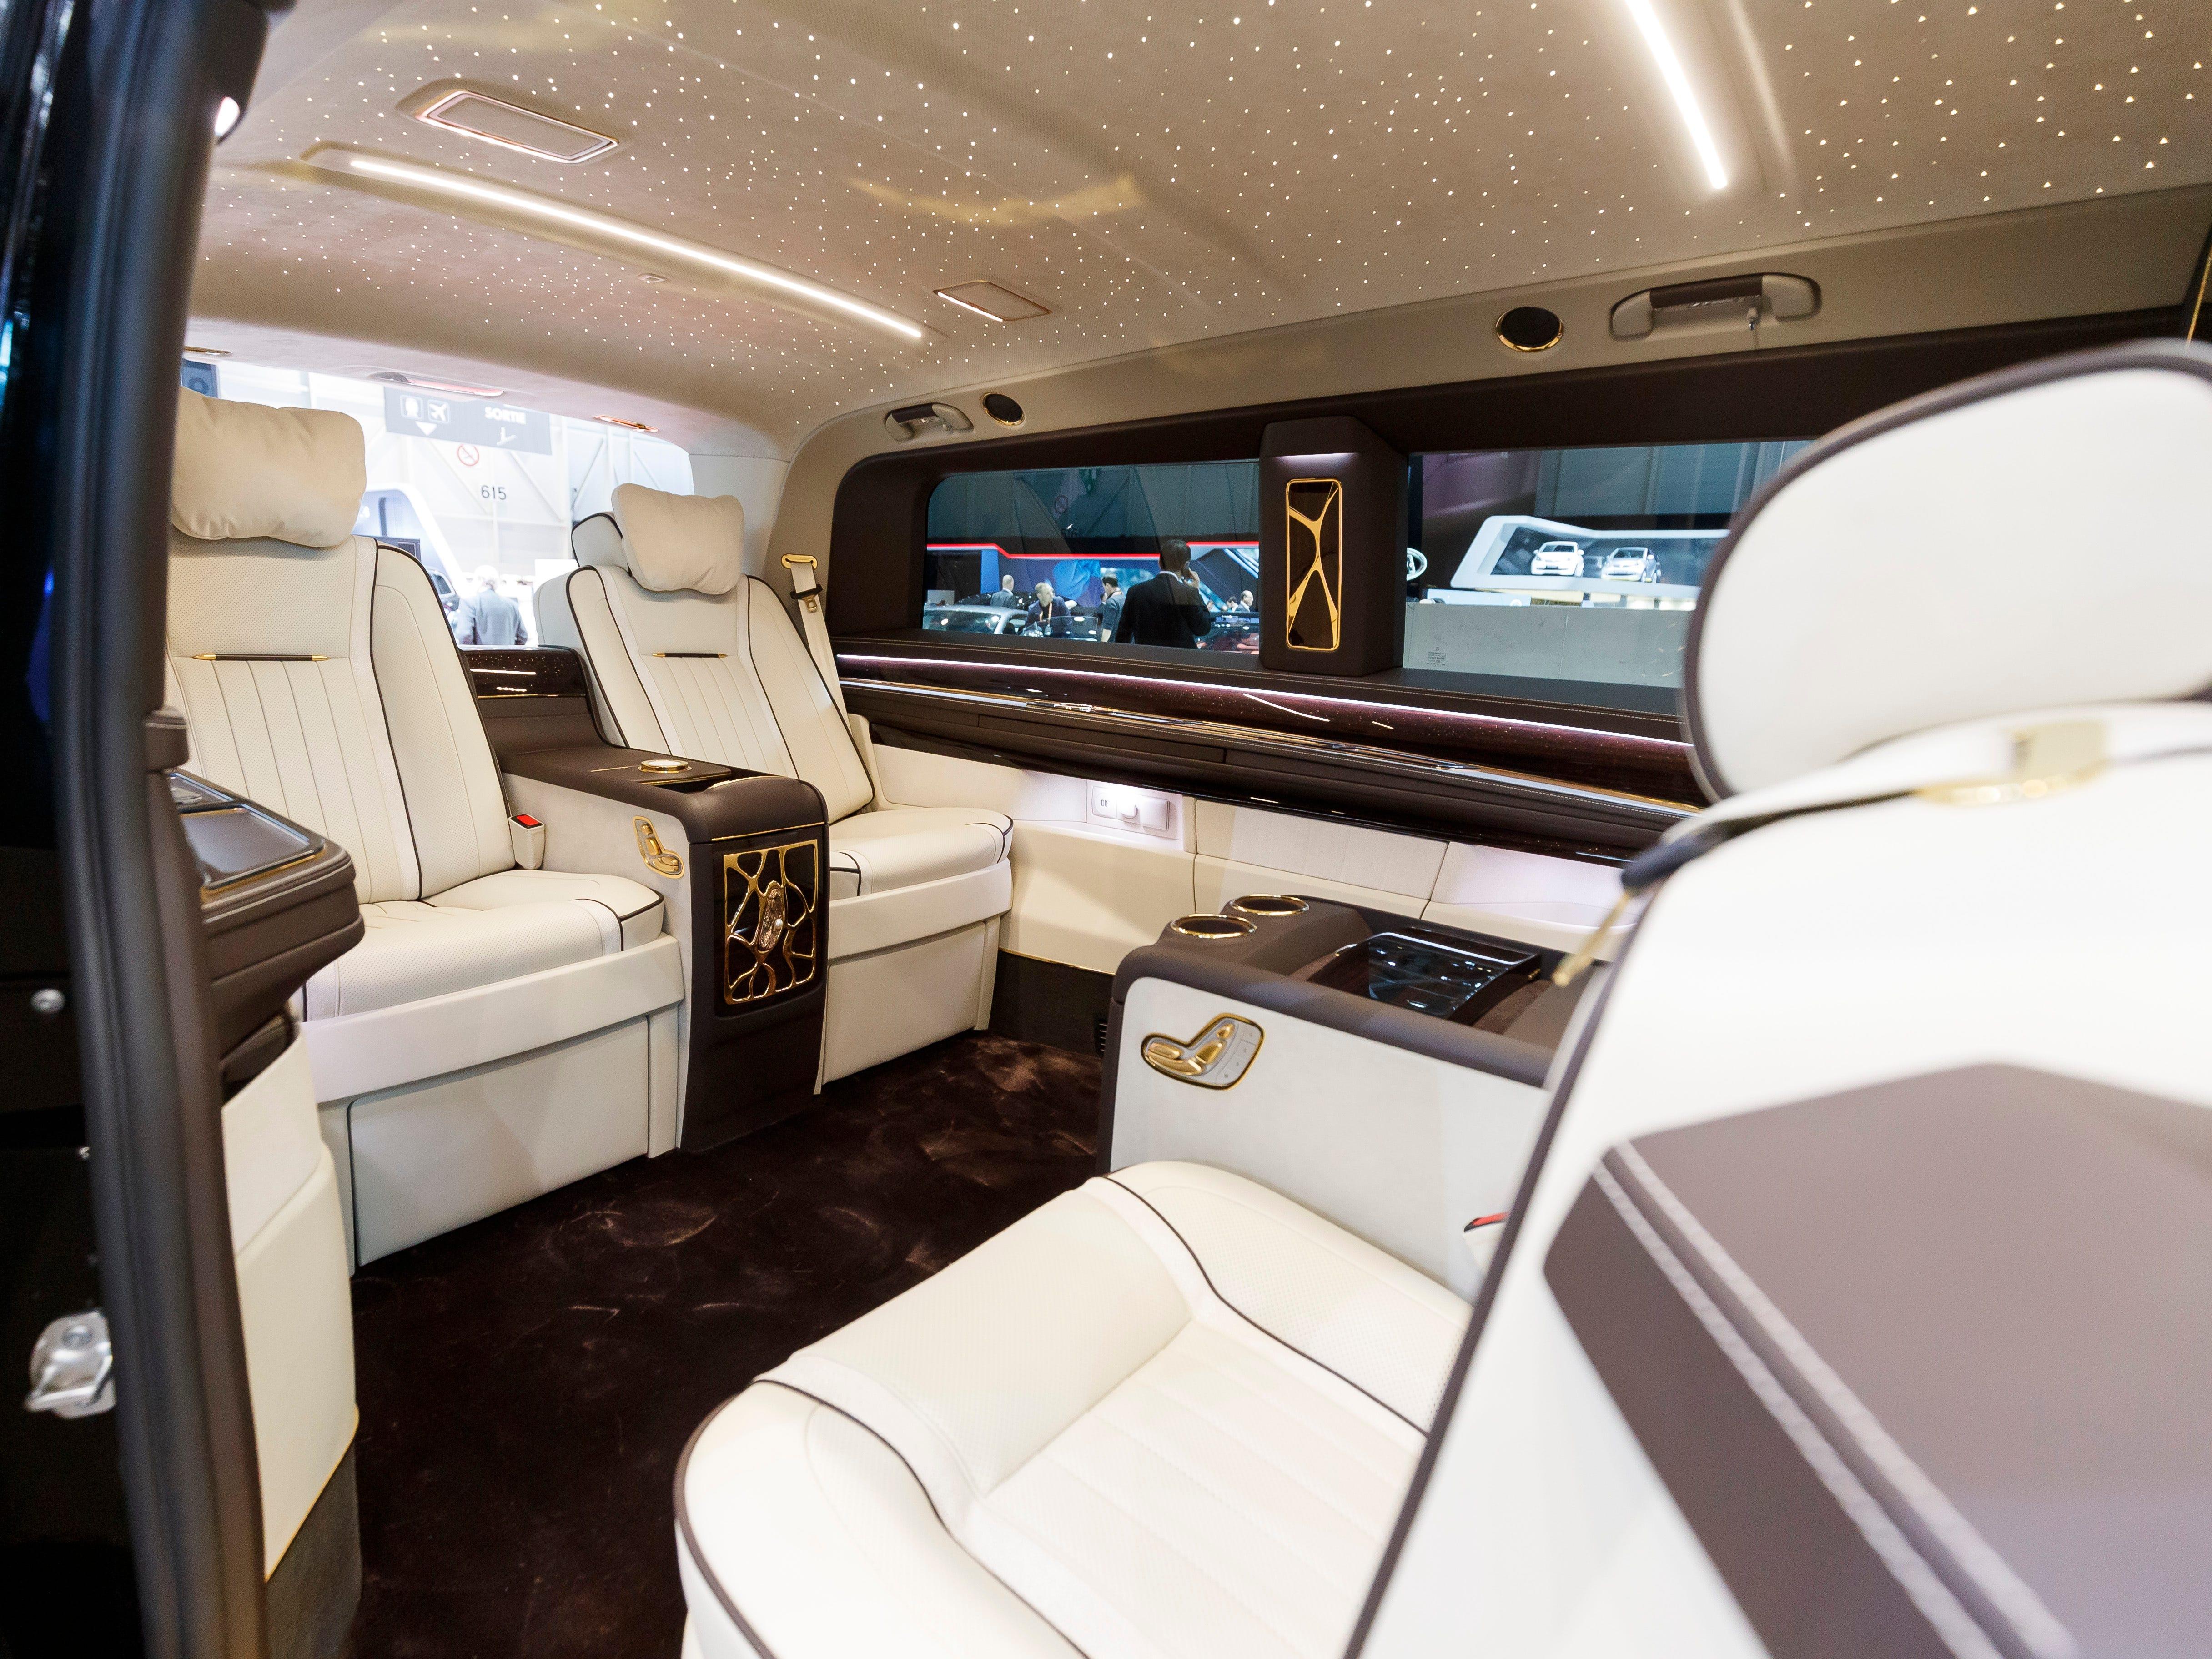 The Okcu Mercedes Benz V-Class VIP Edition